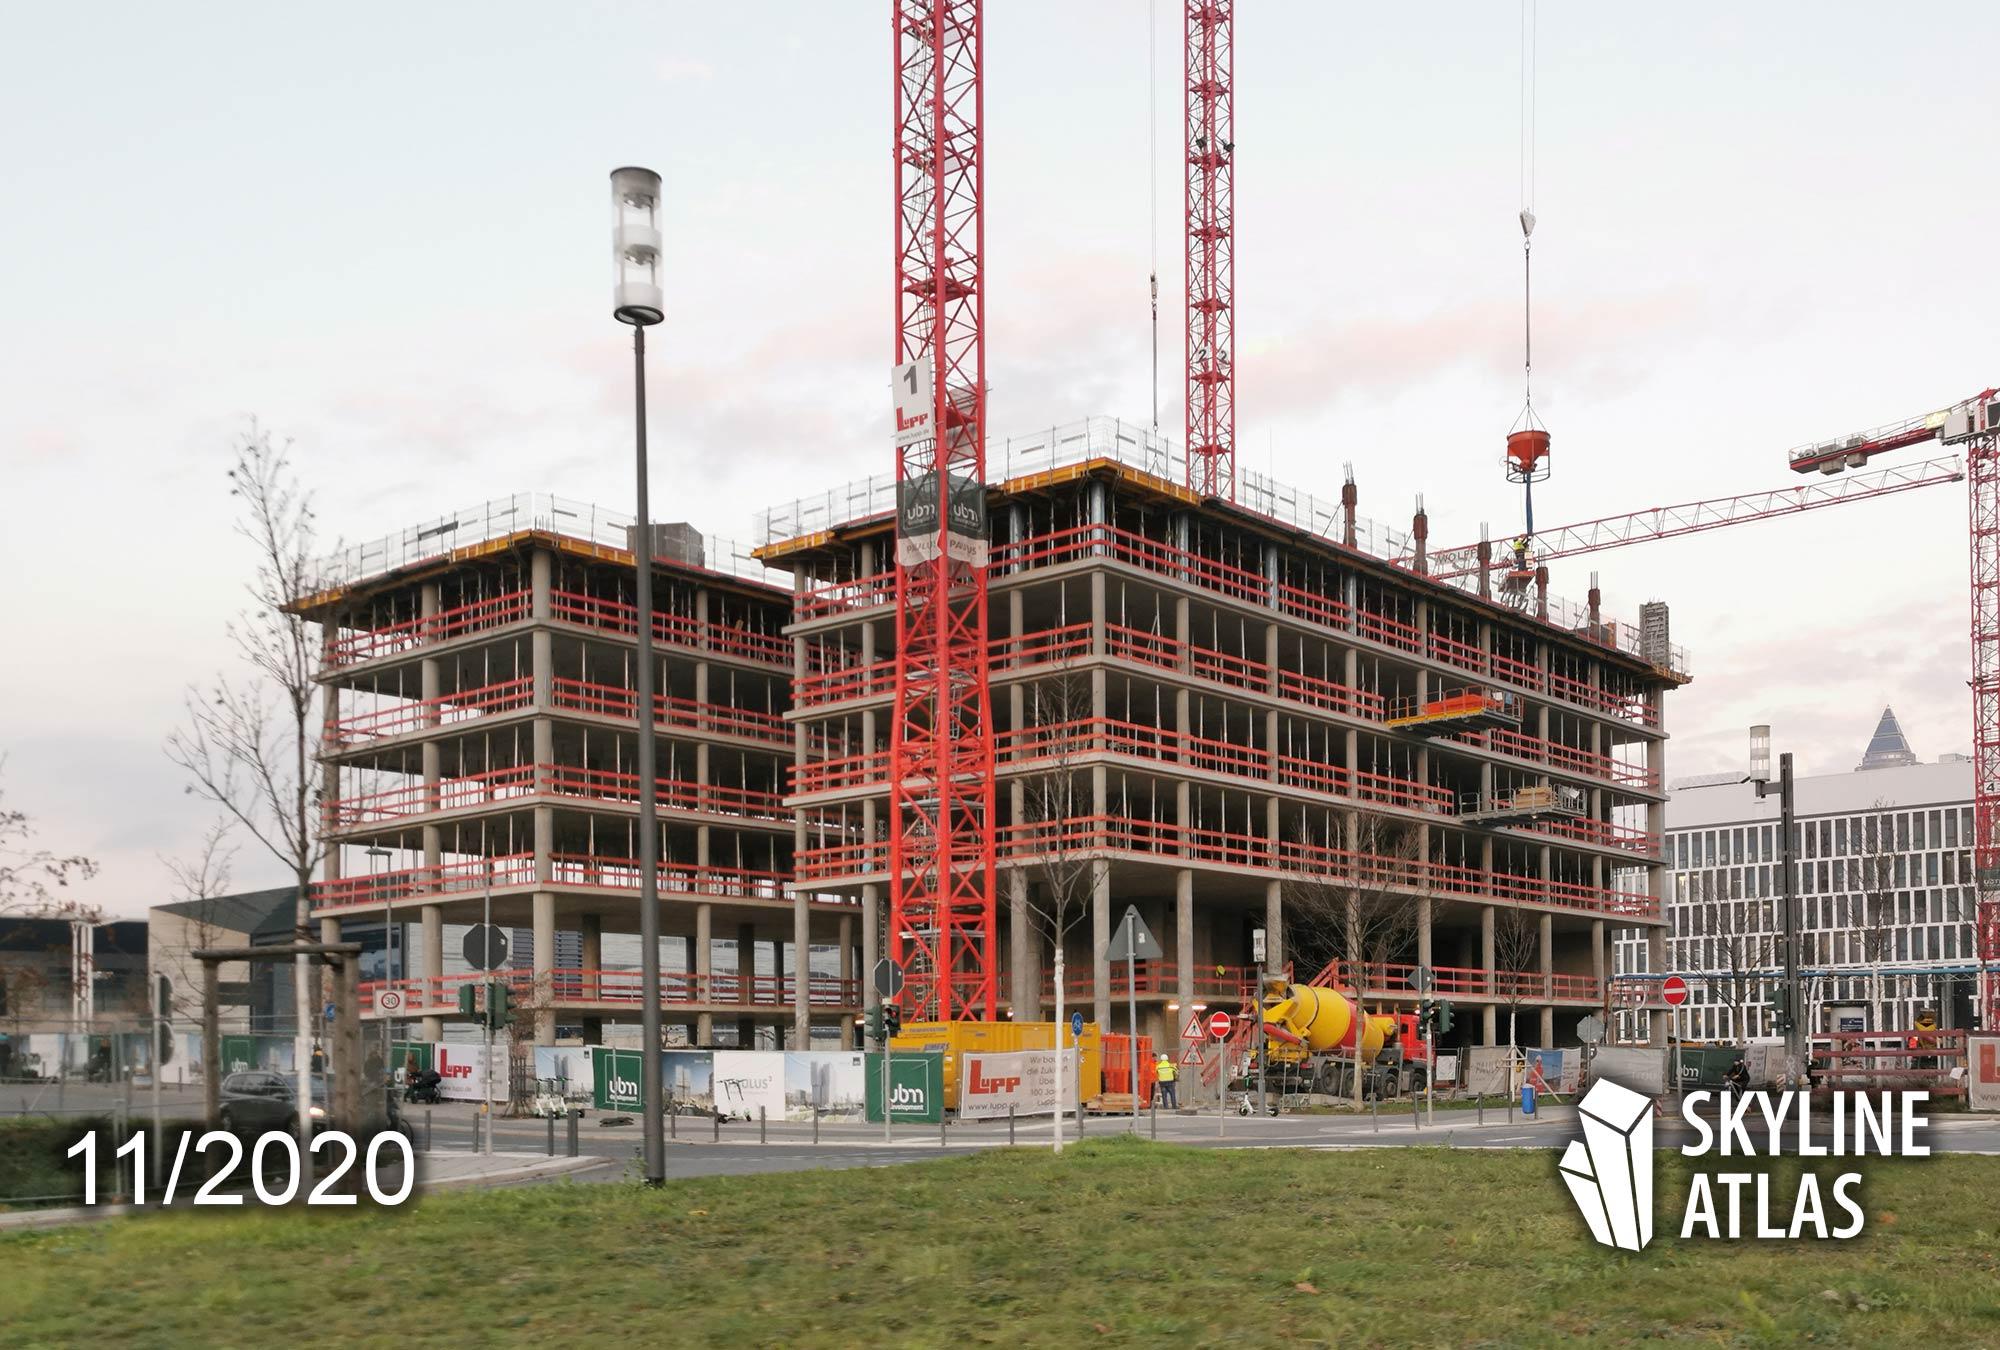 F.A.Z. Tower Frankfurt am Main - FAZ Hochhaus Europaviertel - Neues Hochhaus der Zeitung FAZ - Baustelle November 2020